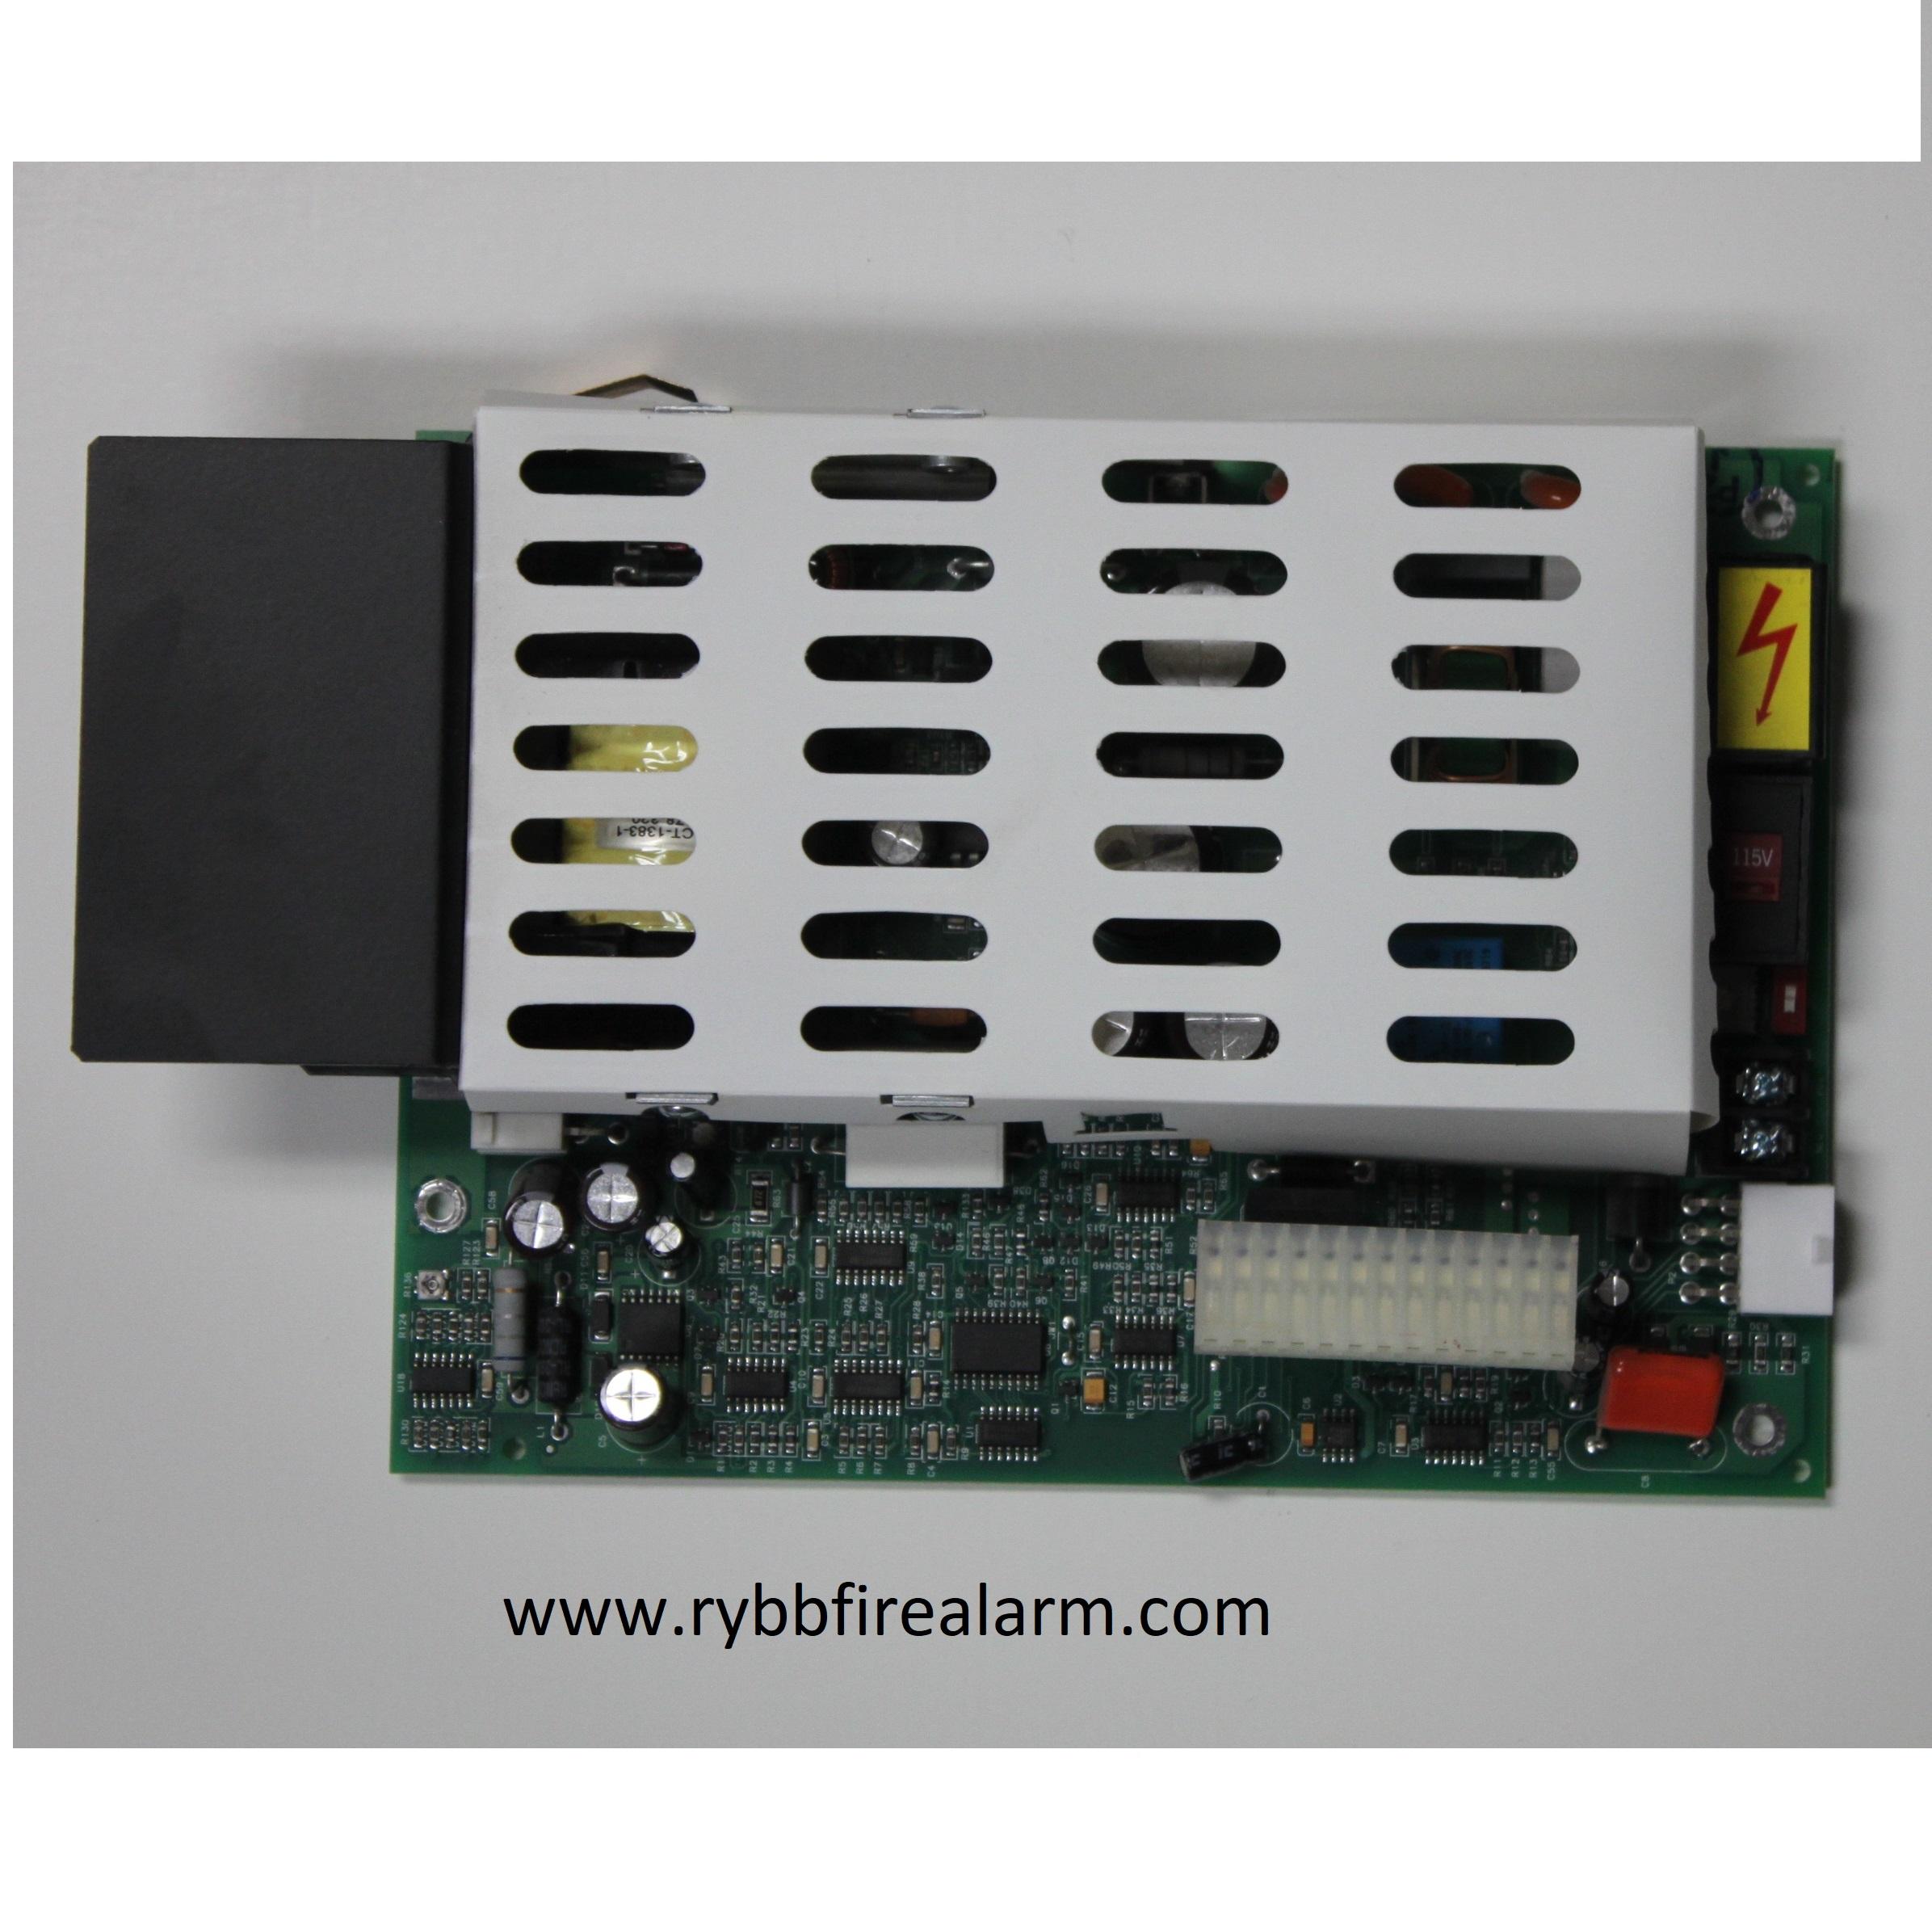 simplex 4005 main power supply rybb fire alarm parts. Black Bedroom Furniture Sets. Home Design Ideas